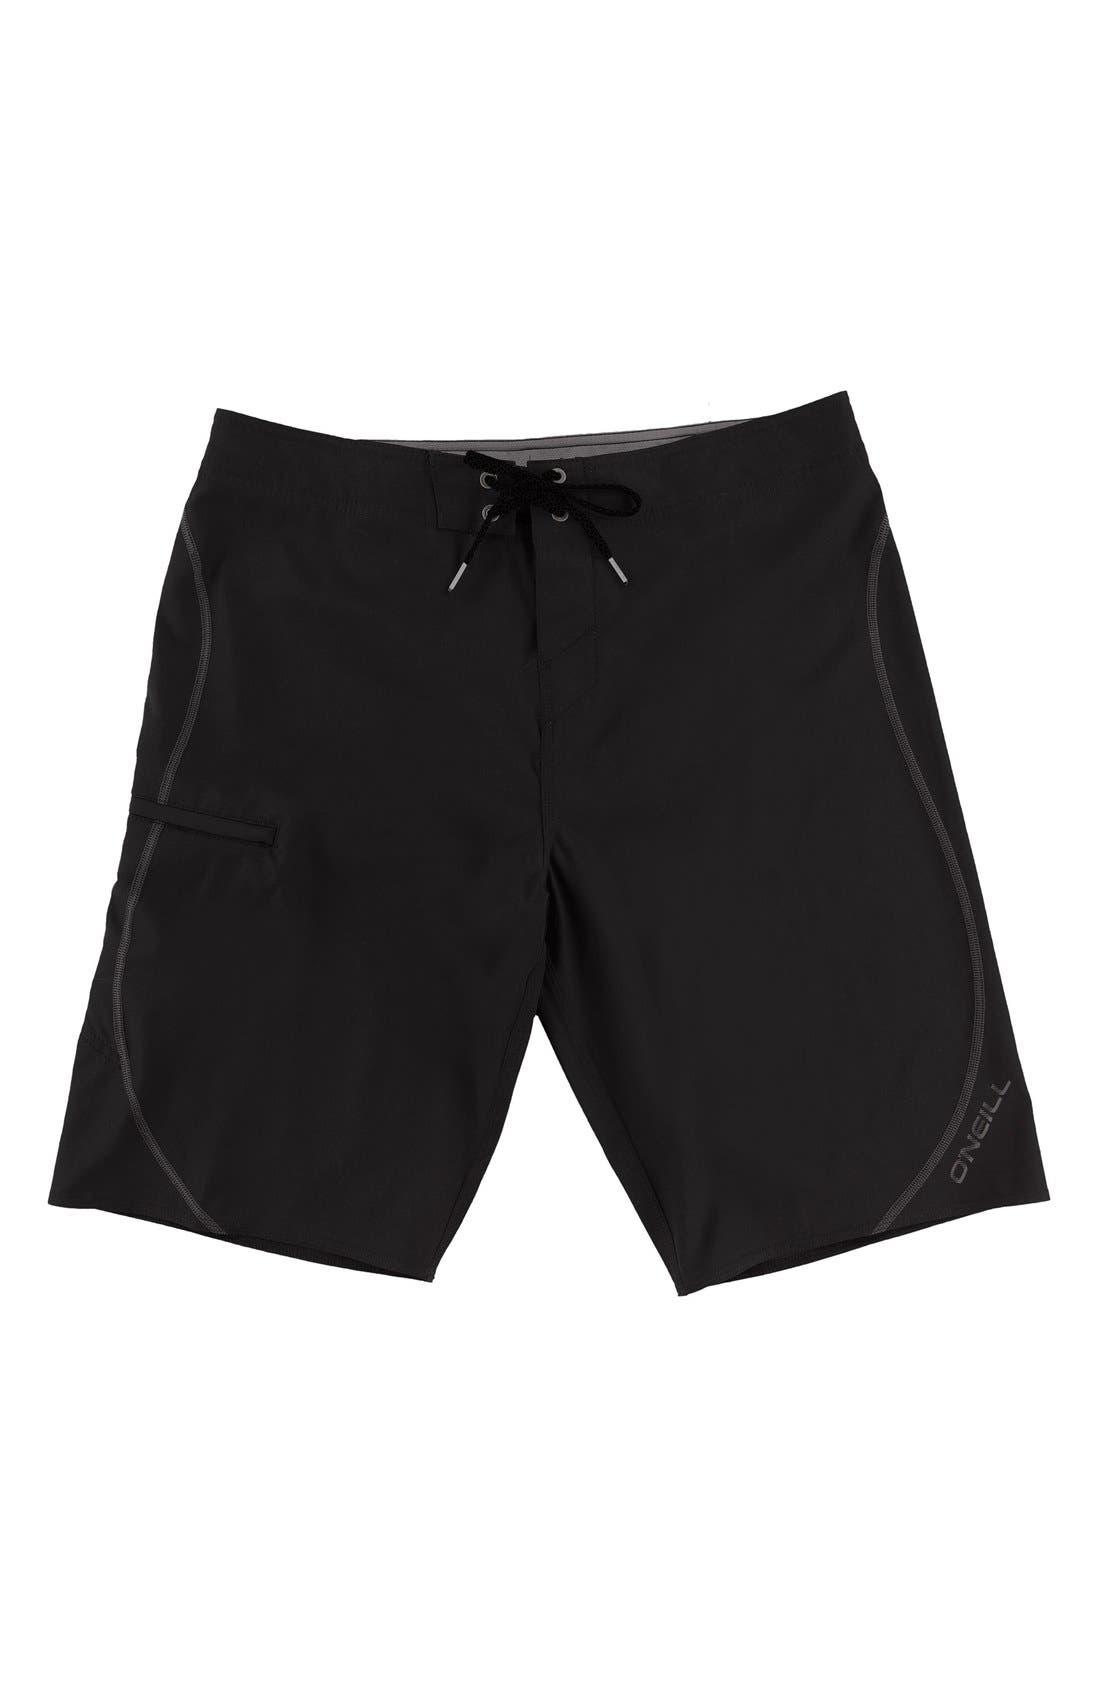 Hyperfreak S-Seam Stretch Board Shorts,                         Main,                         color, 001